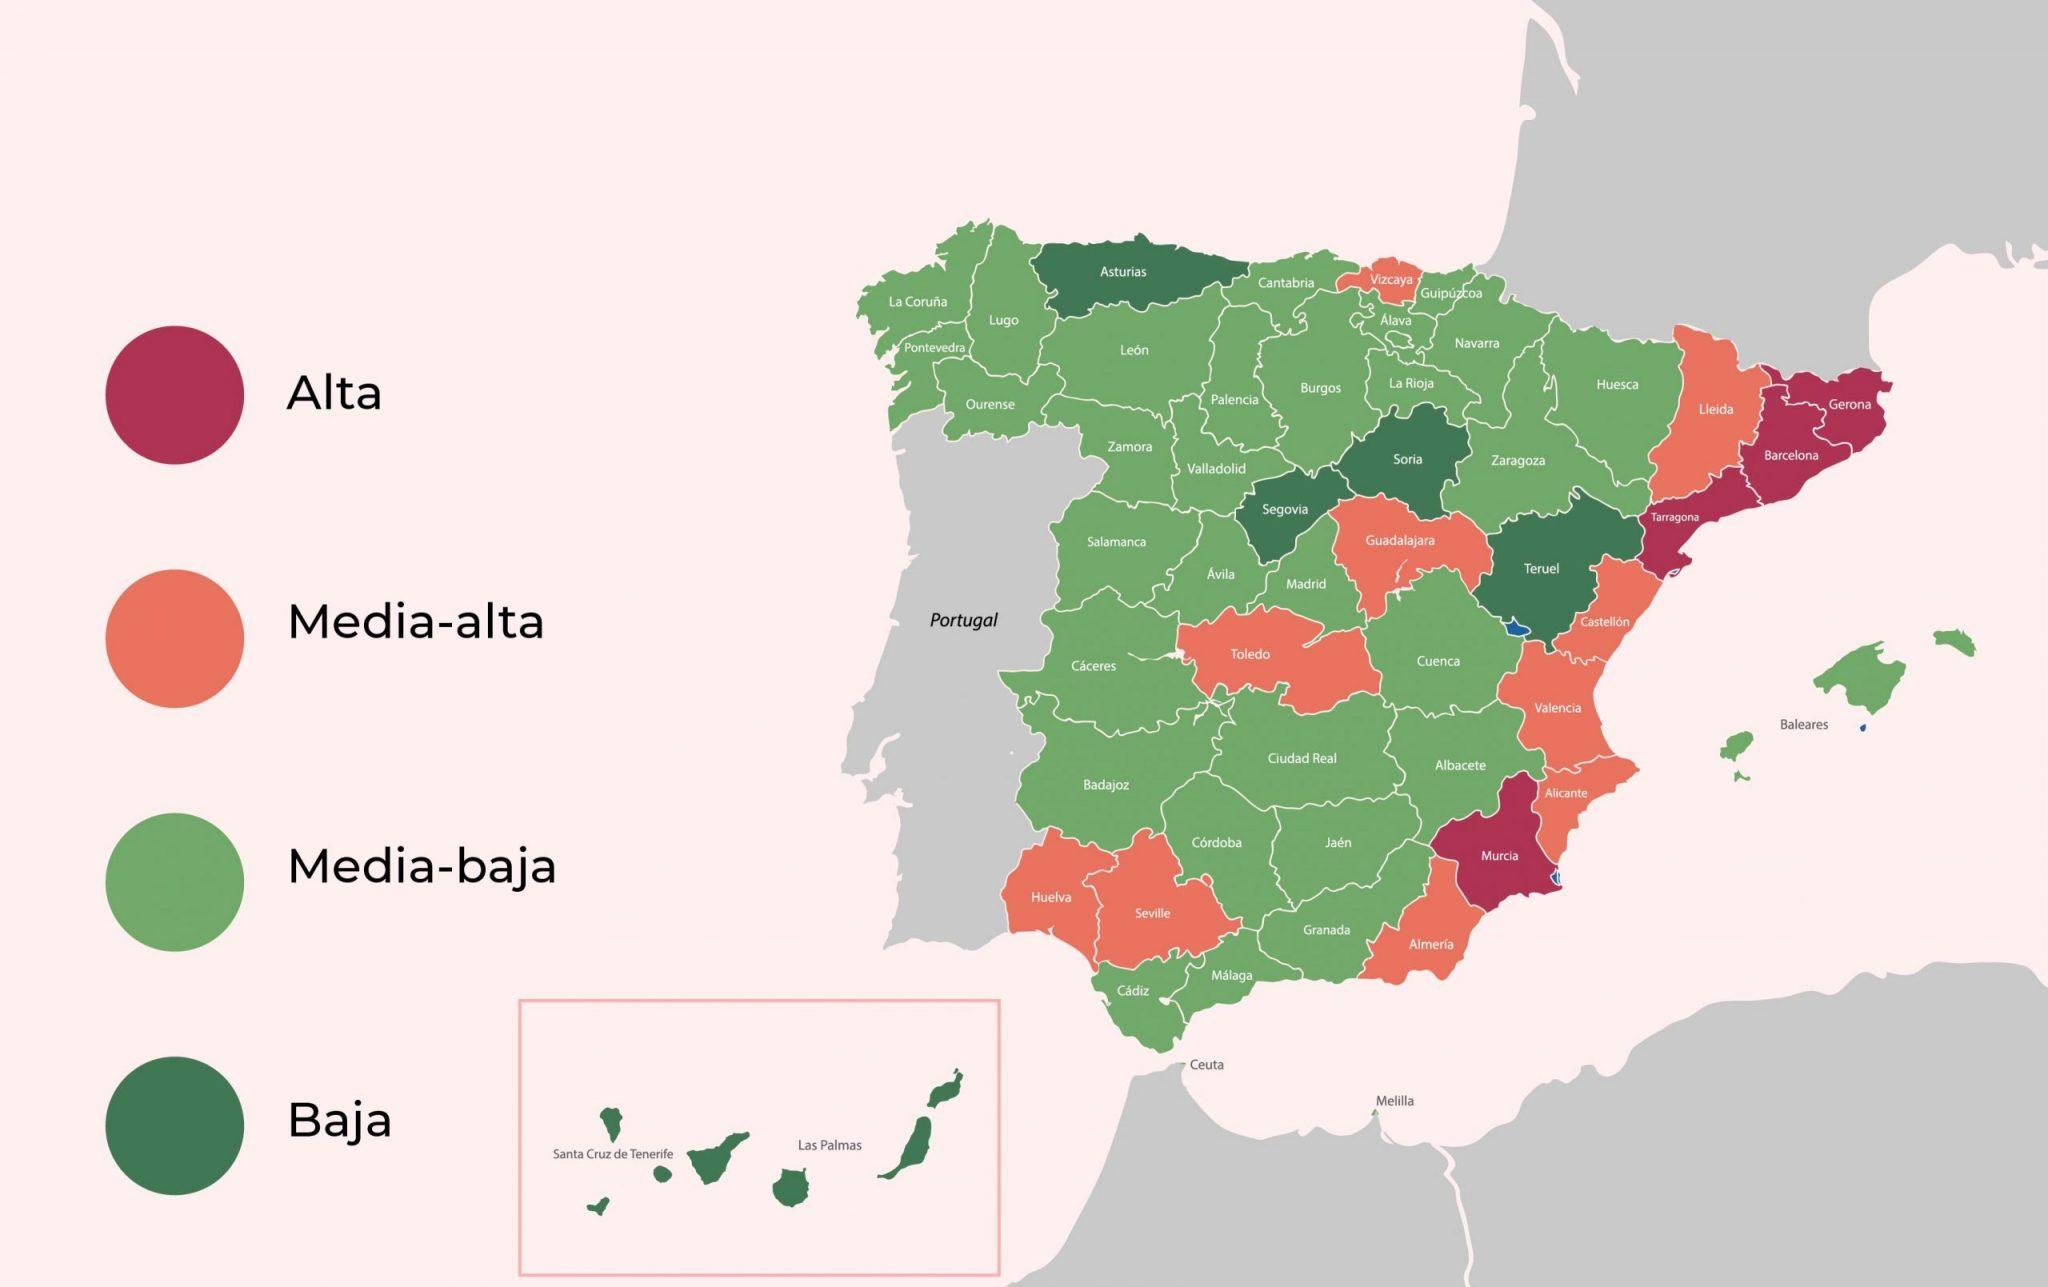 mapa estadisticas robo espana